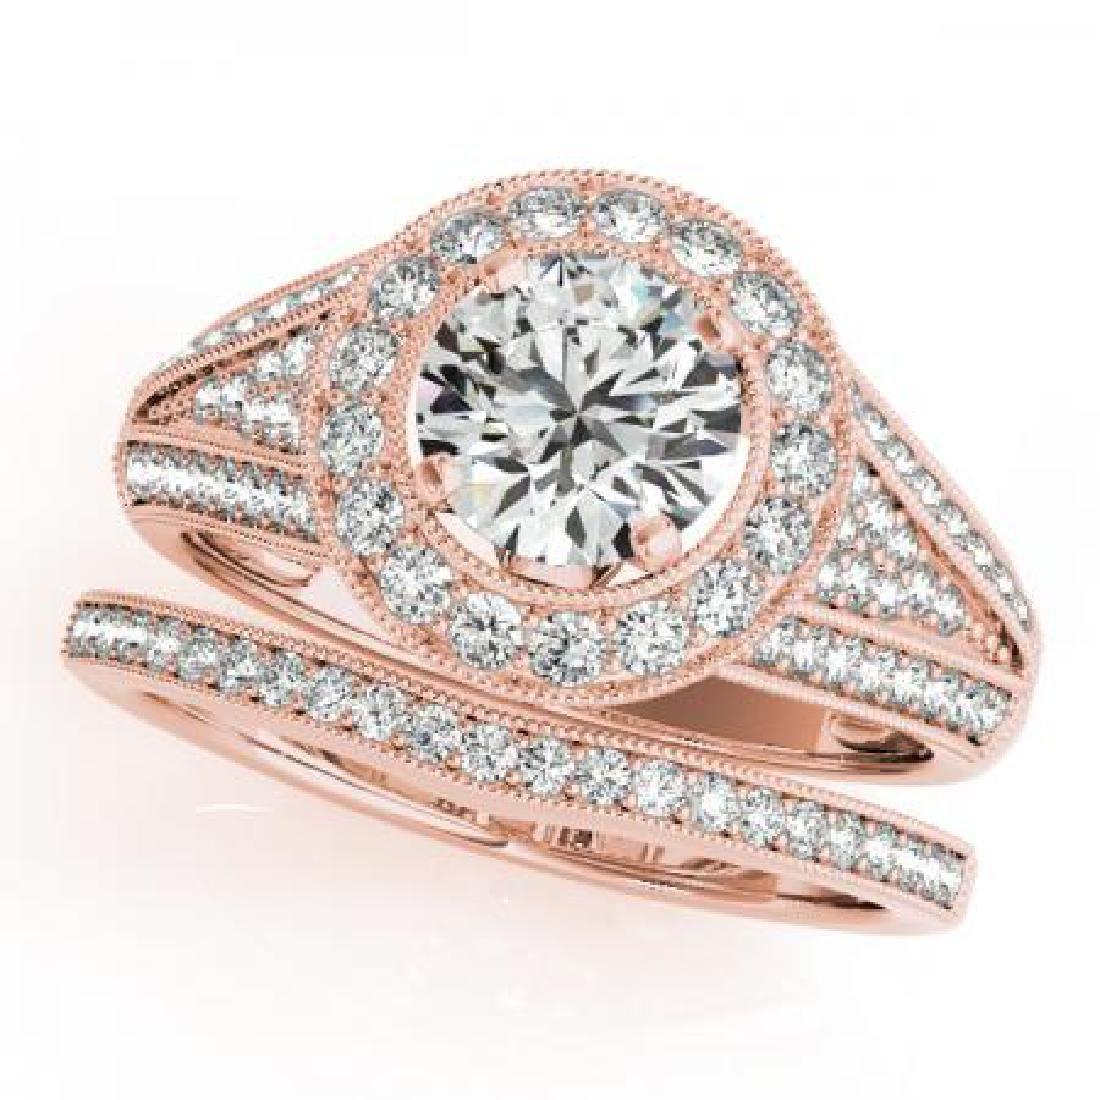 CERTIFIED 14KT ROSE GOLD 0.95 CT G-H/VS-SI1 DIAMOND HAL